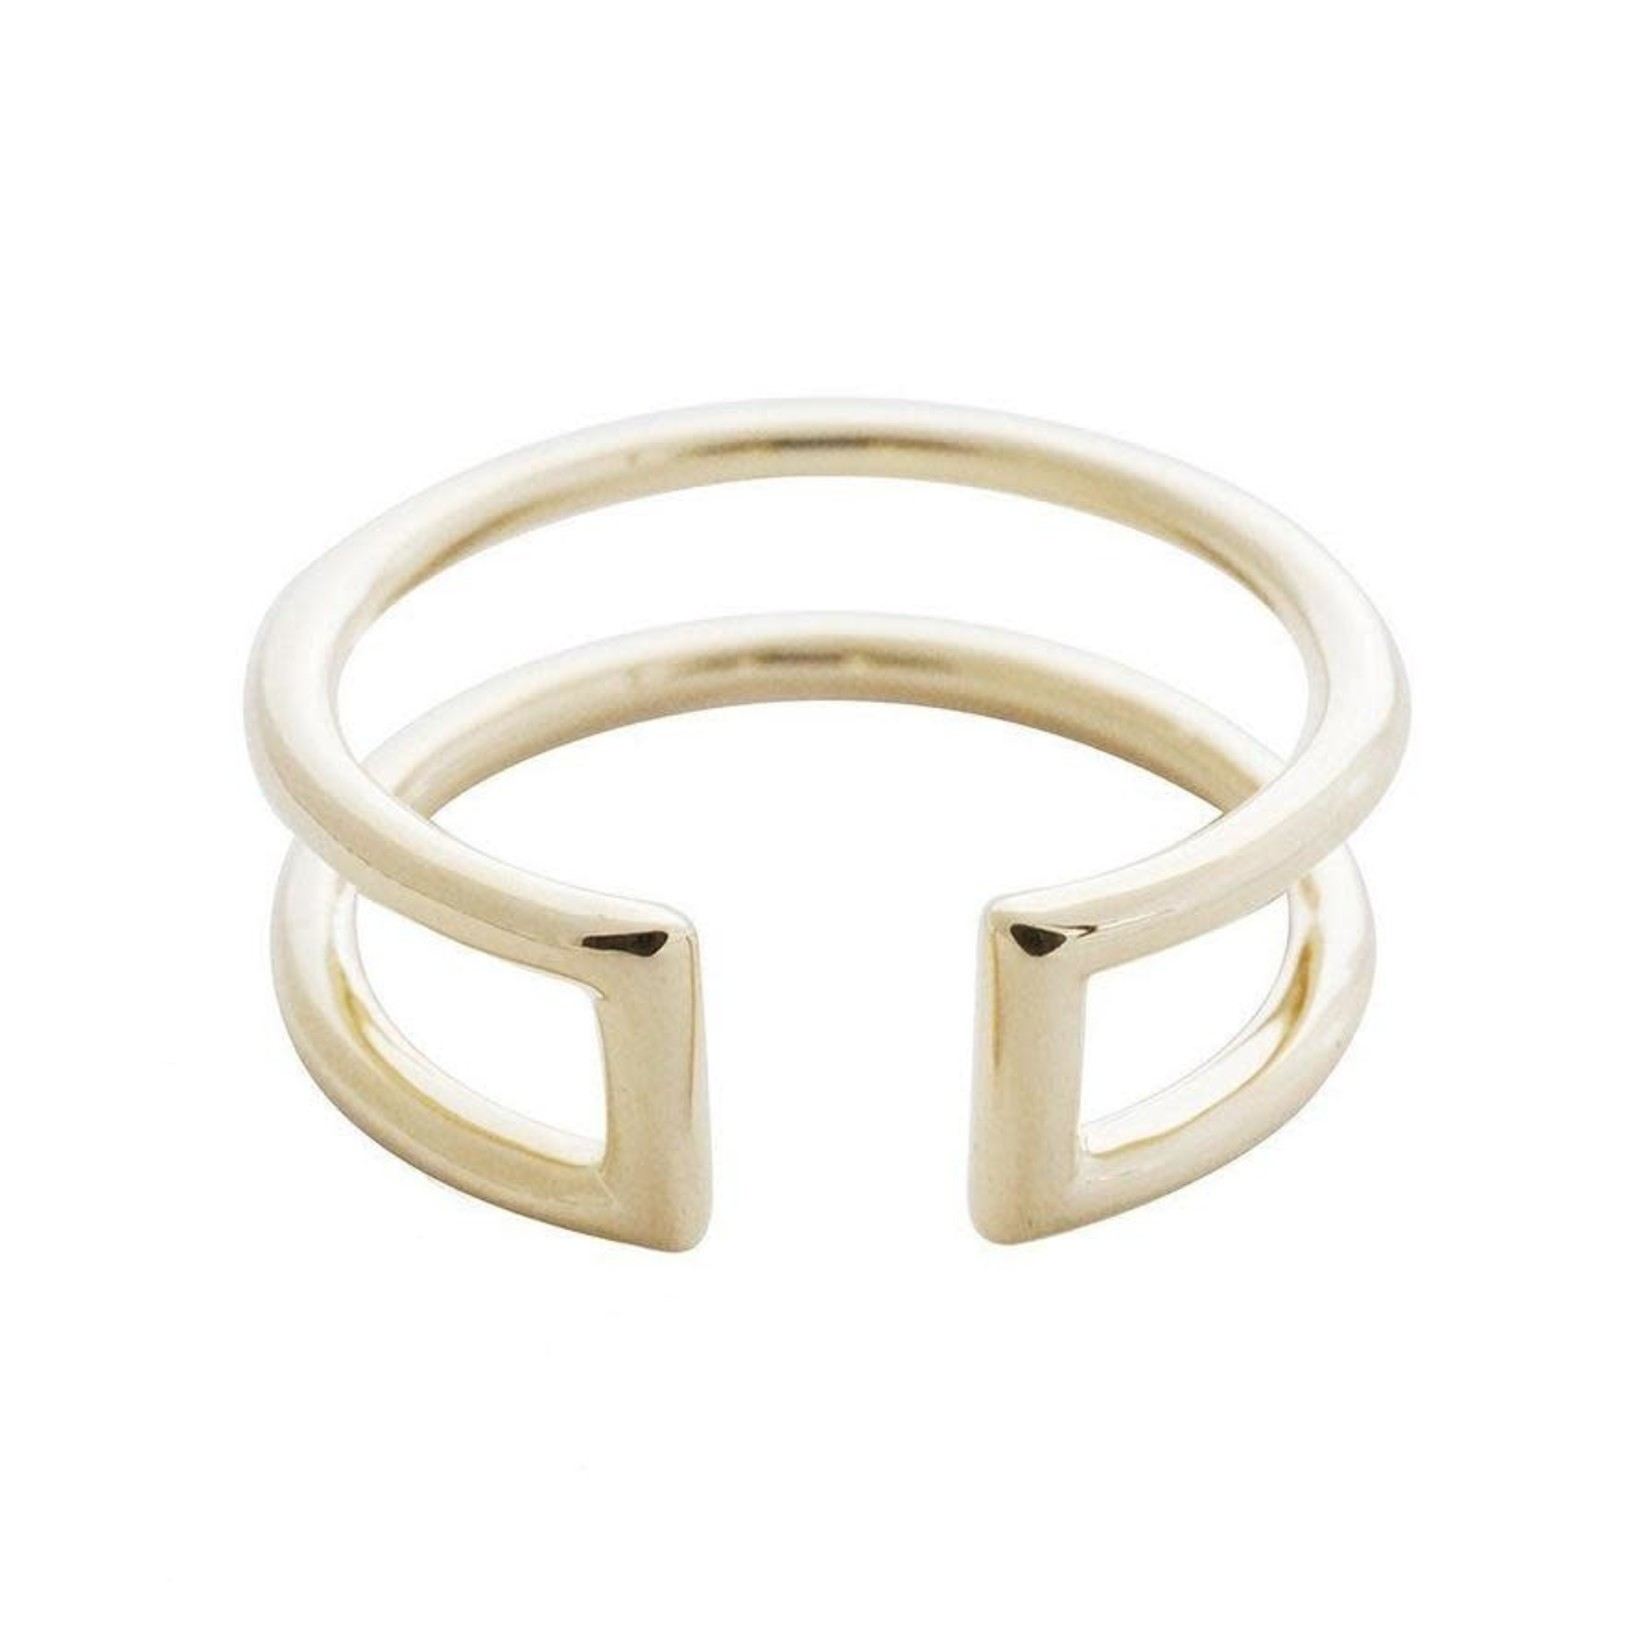 Honeycat Jewelry Honeycat Double Stack Ring